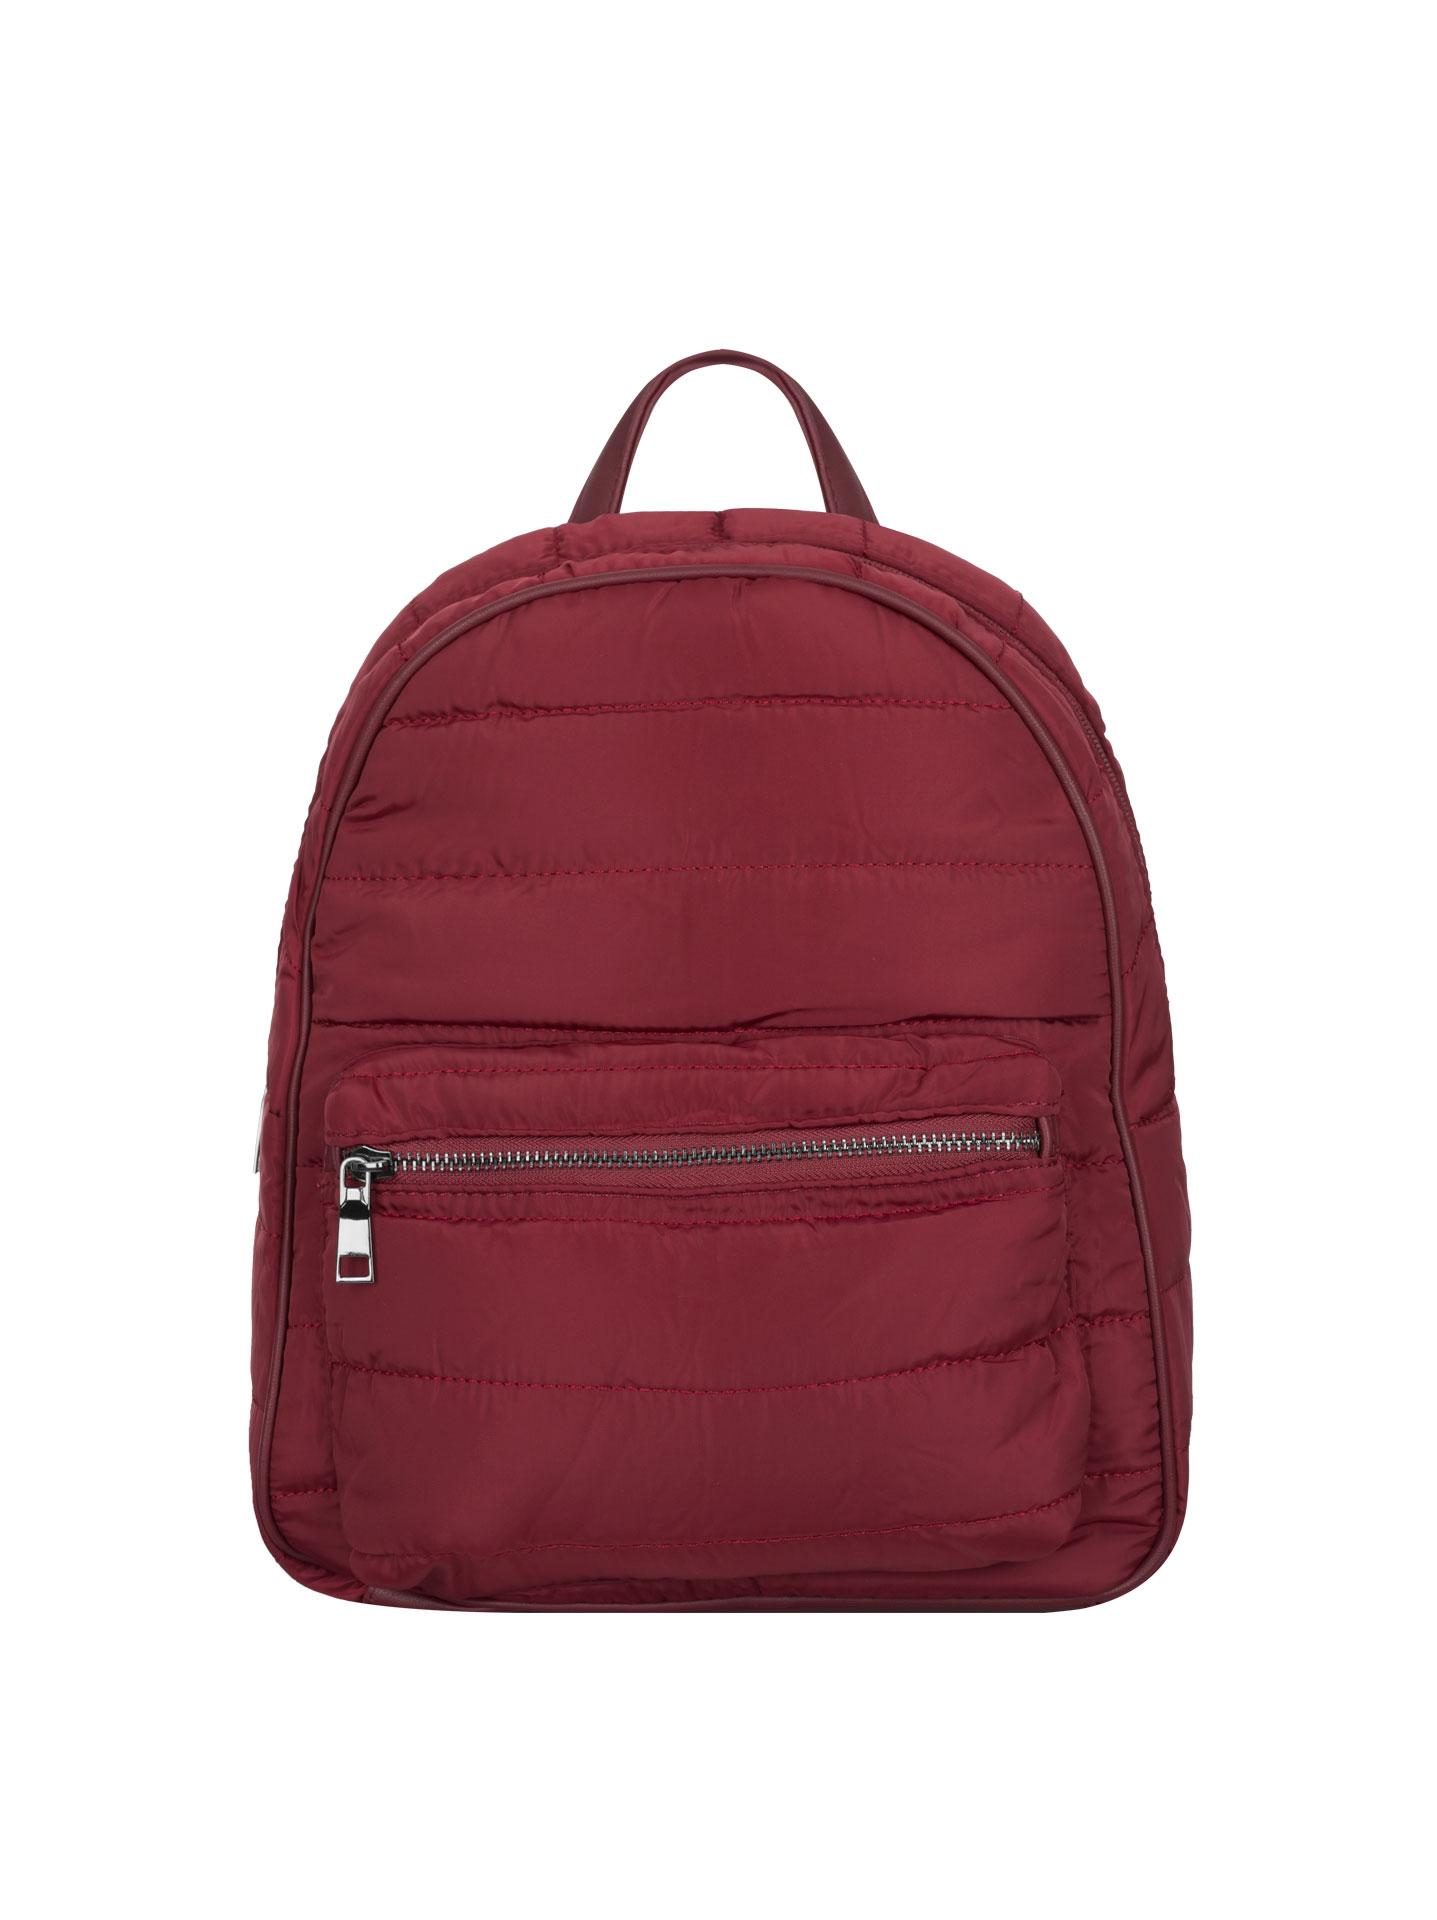 Quilted waterproof backpack wine red ca53bdb0471b2